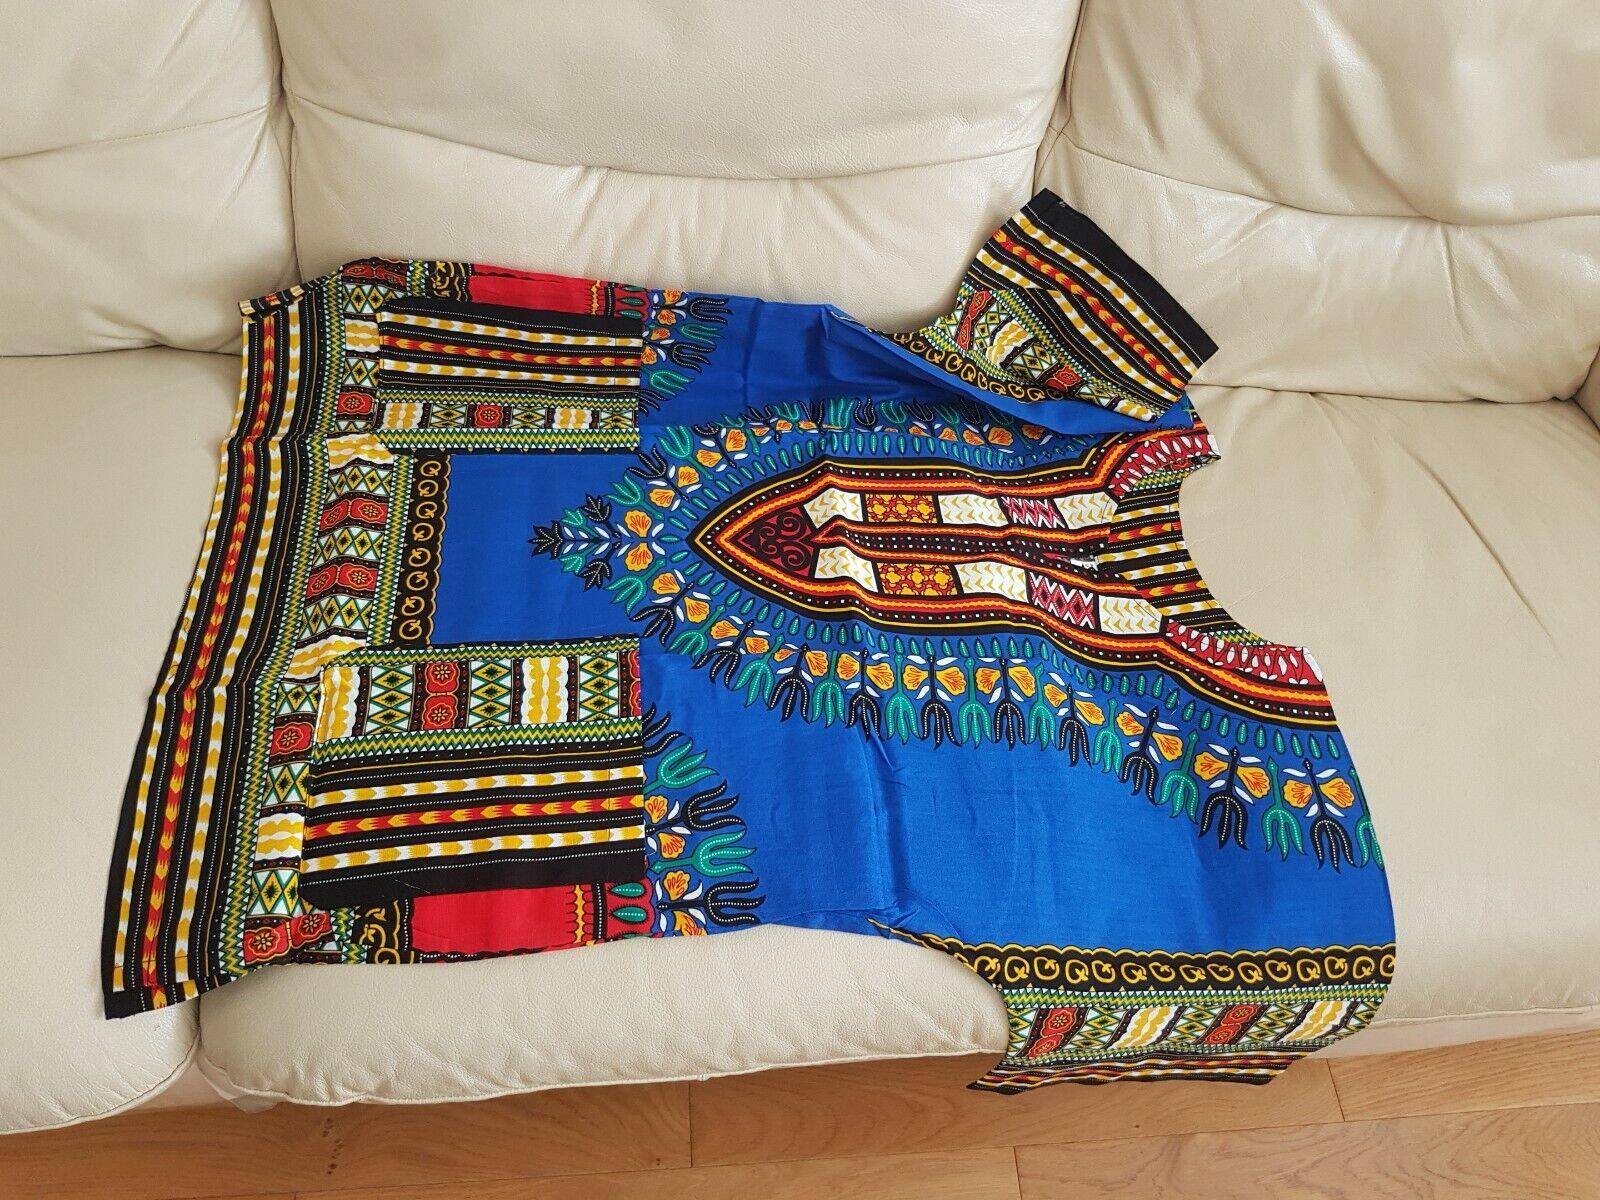 Unisex Dashiki African Tribal Print Blouse or Kitenge Top Shirt Red Size S No.3